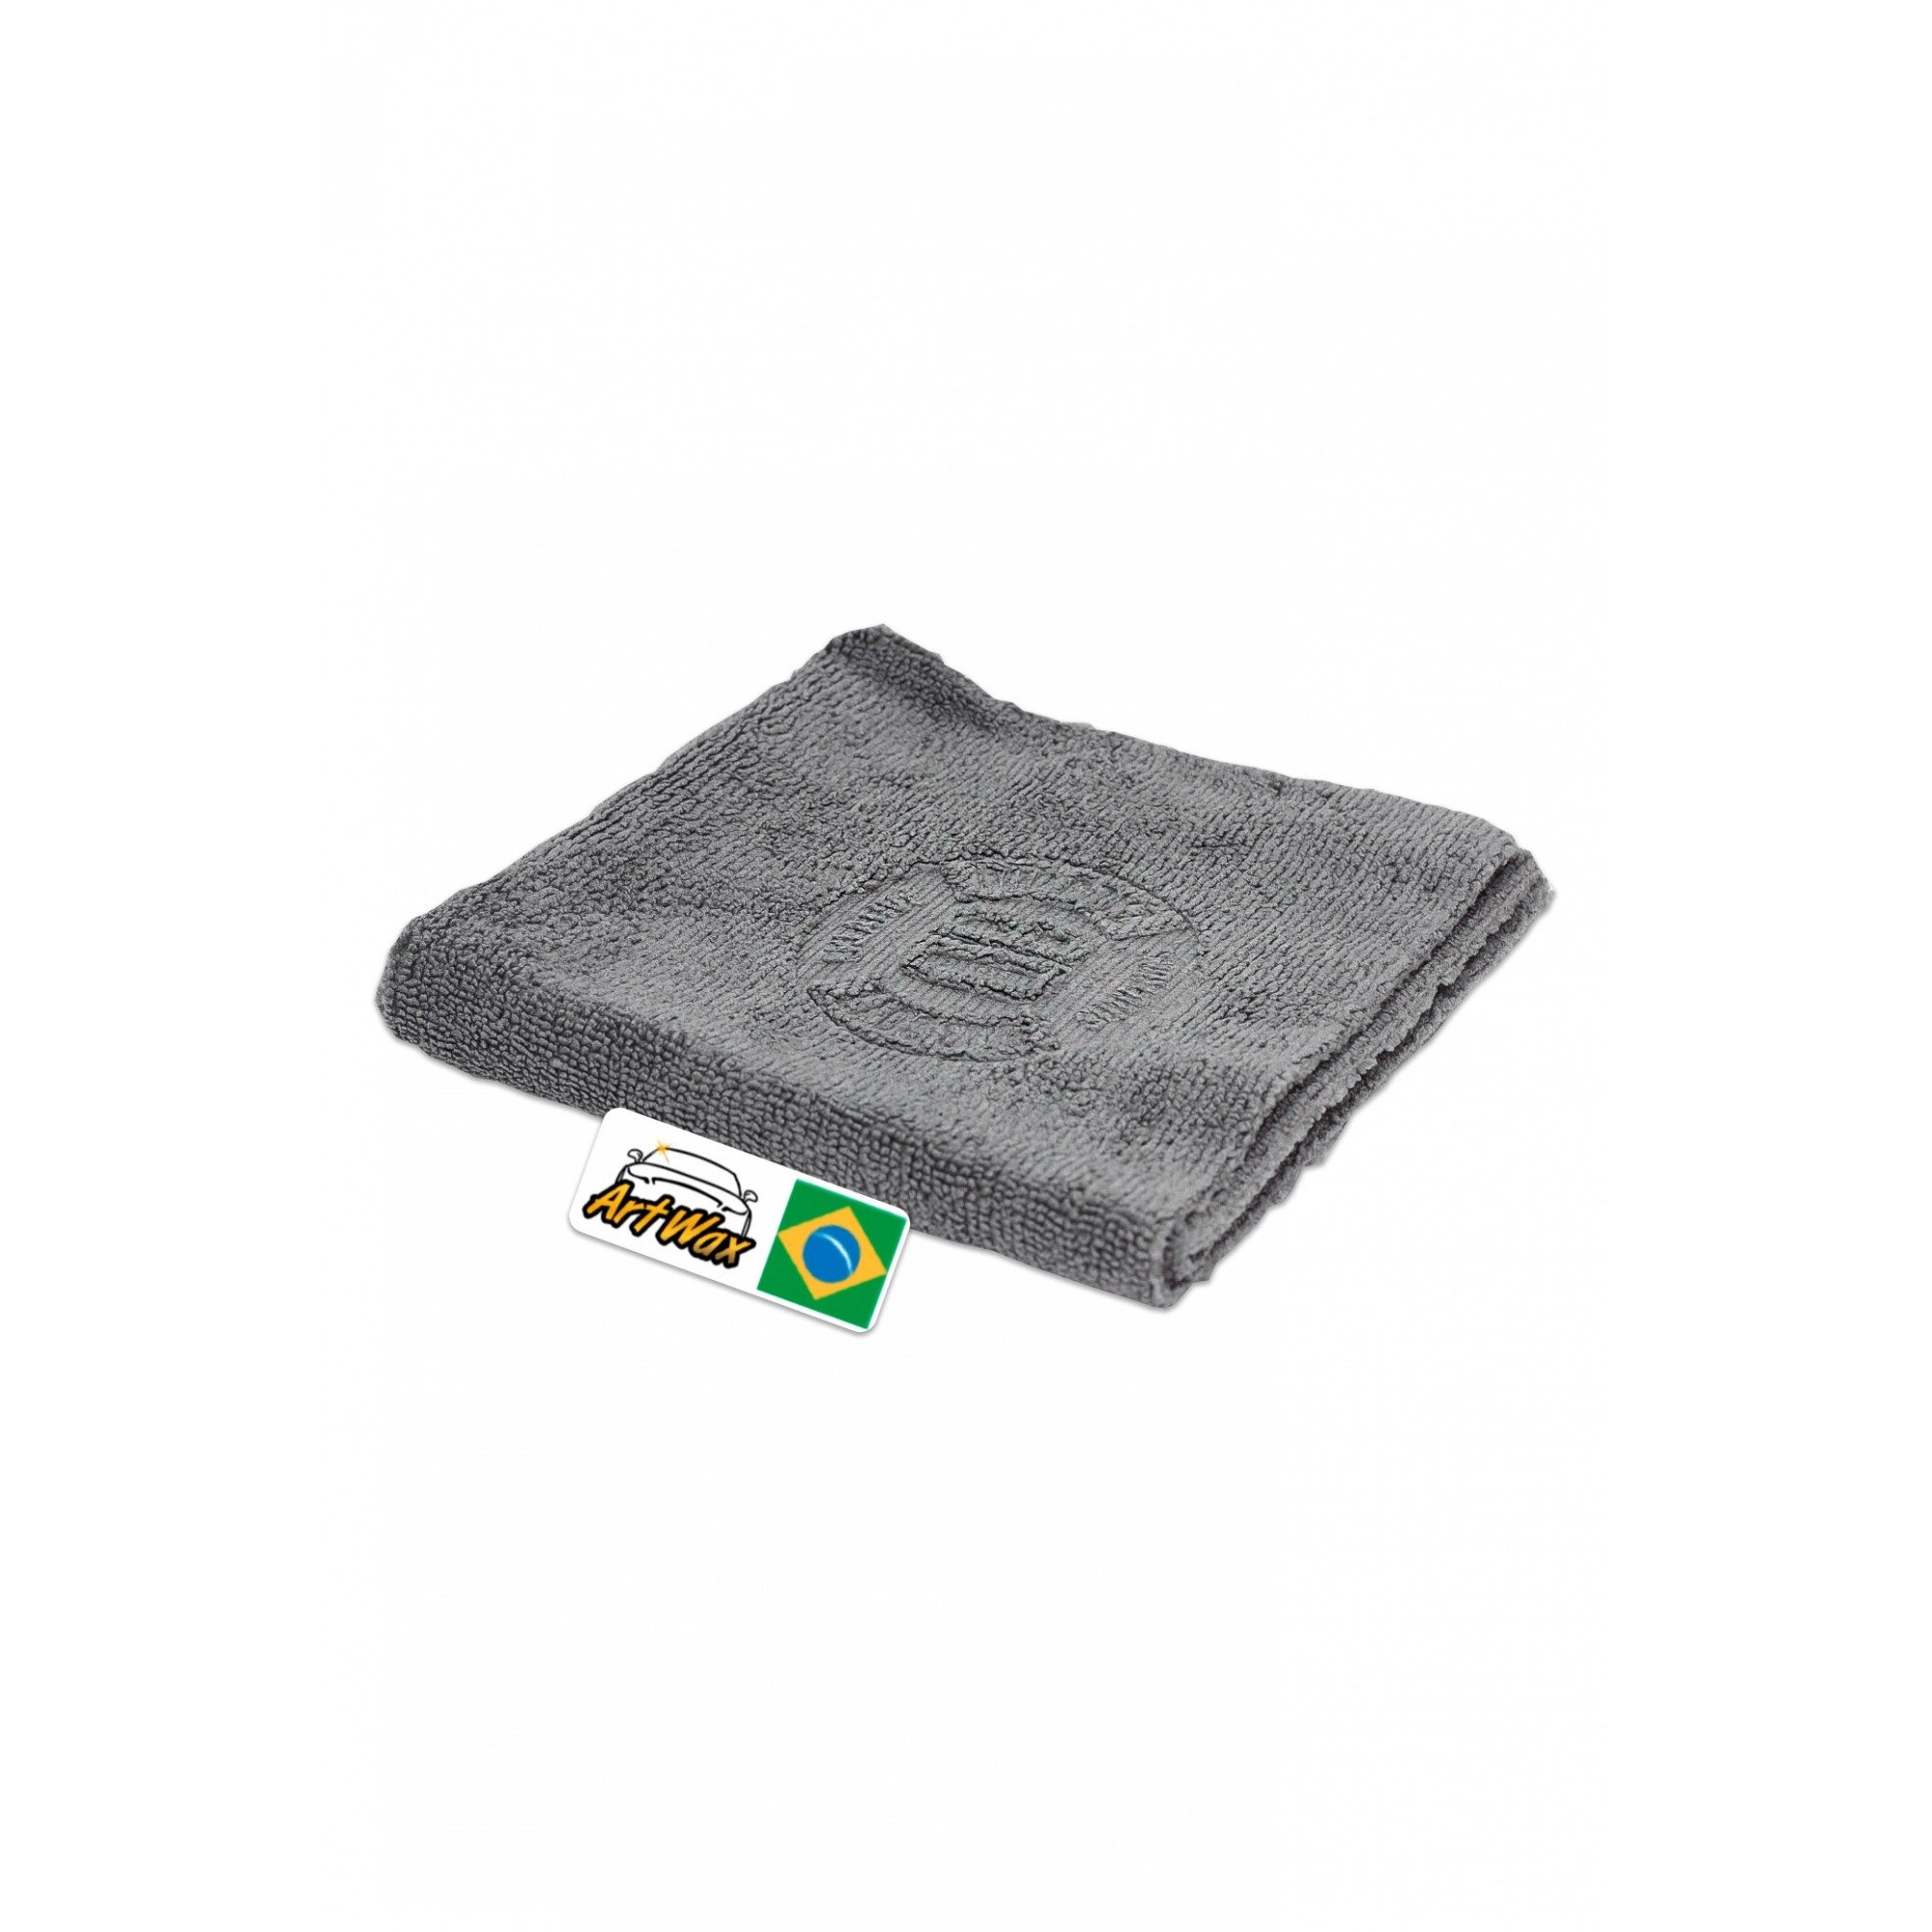 Microfibra Vitrificação Cinza DB Coating Towel 30x30cm - 300gsm Dub Boyz